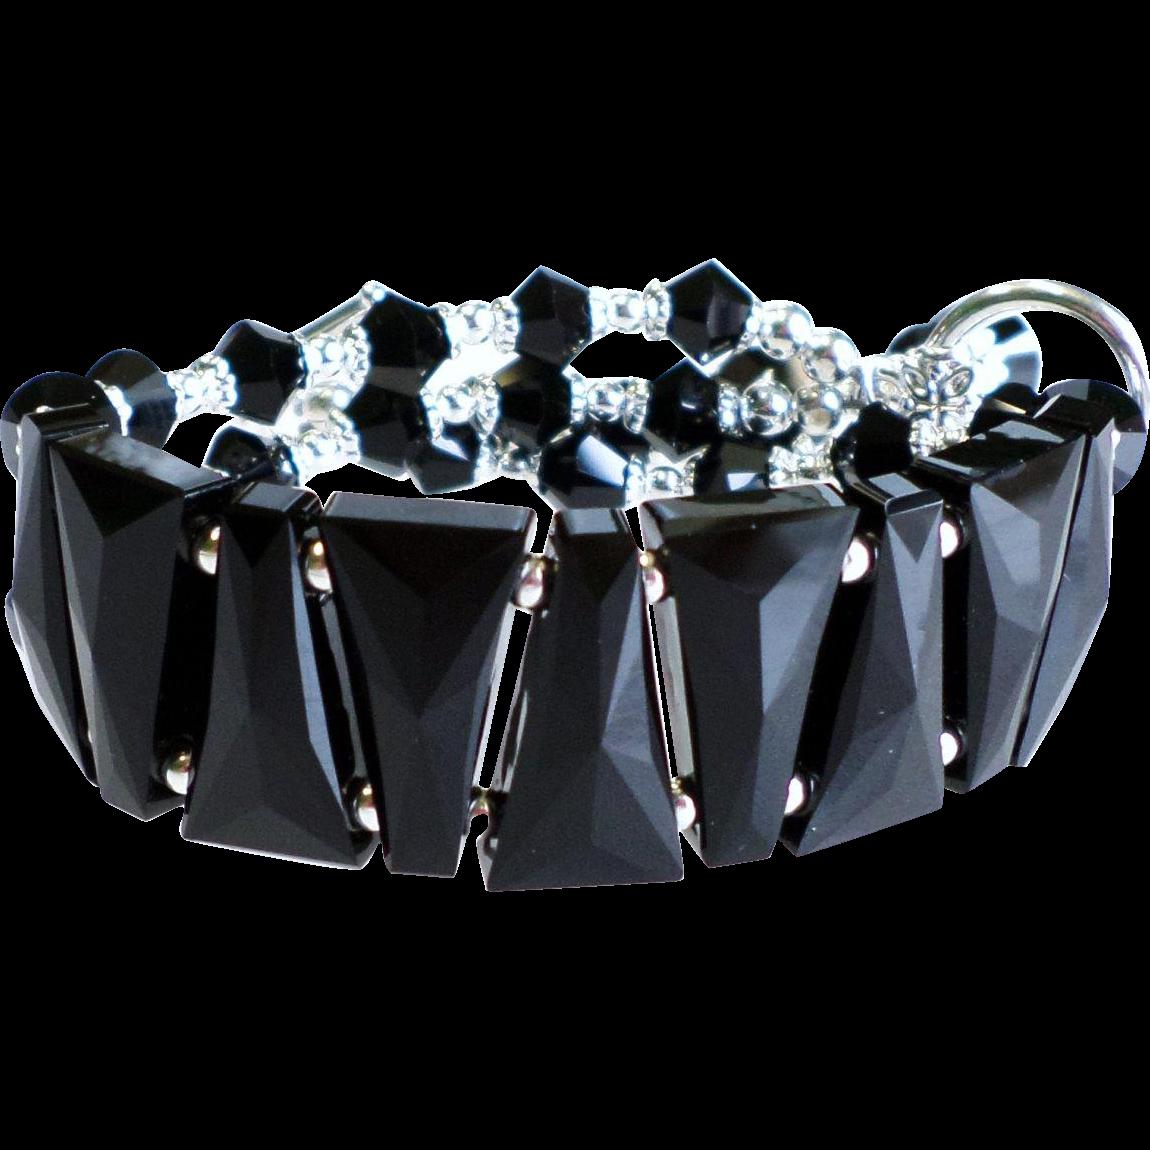 Black Swarovski Crystal Statement Bracelet In Cuff Style